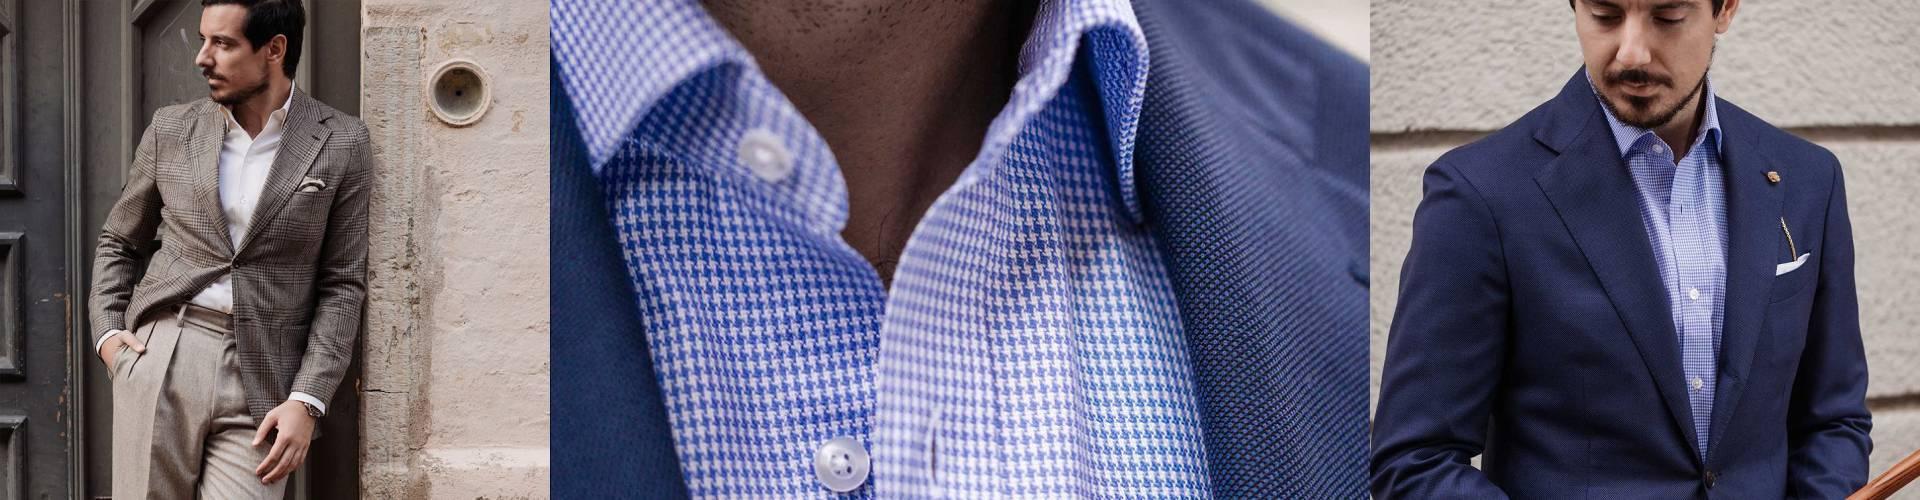 Oxford Dress Shirts